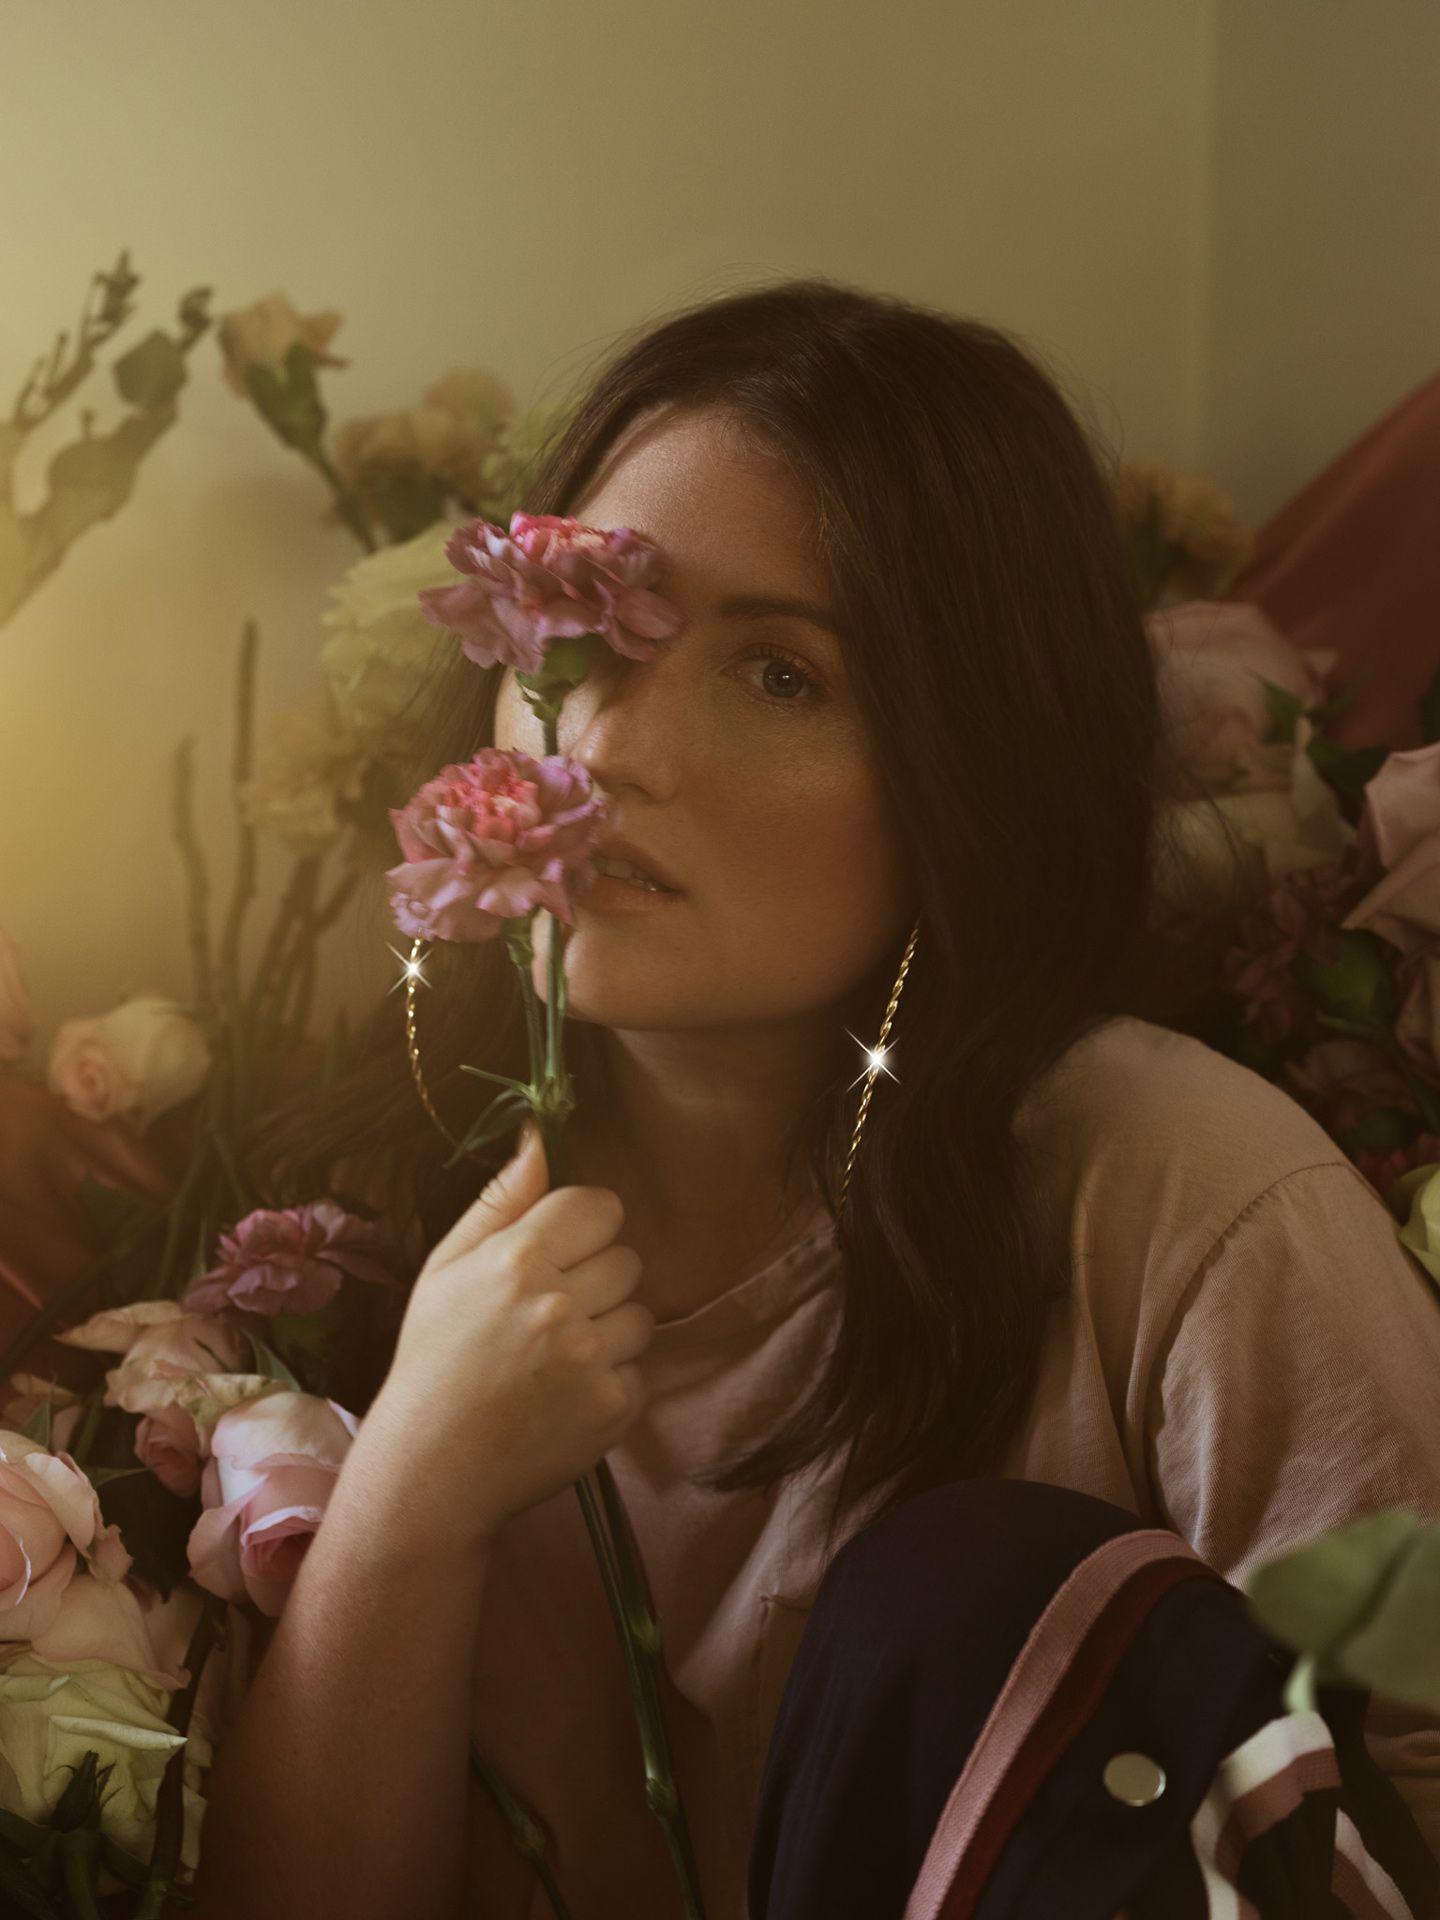 portrait of singer Fanny Bloom half-hidden behind a bouquet of roses for her album Liqueur by Maxyme G. Delisle